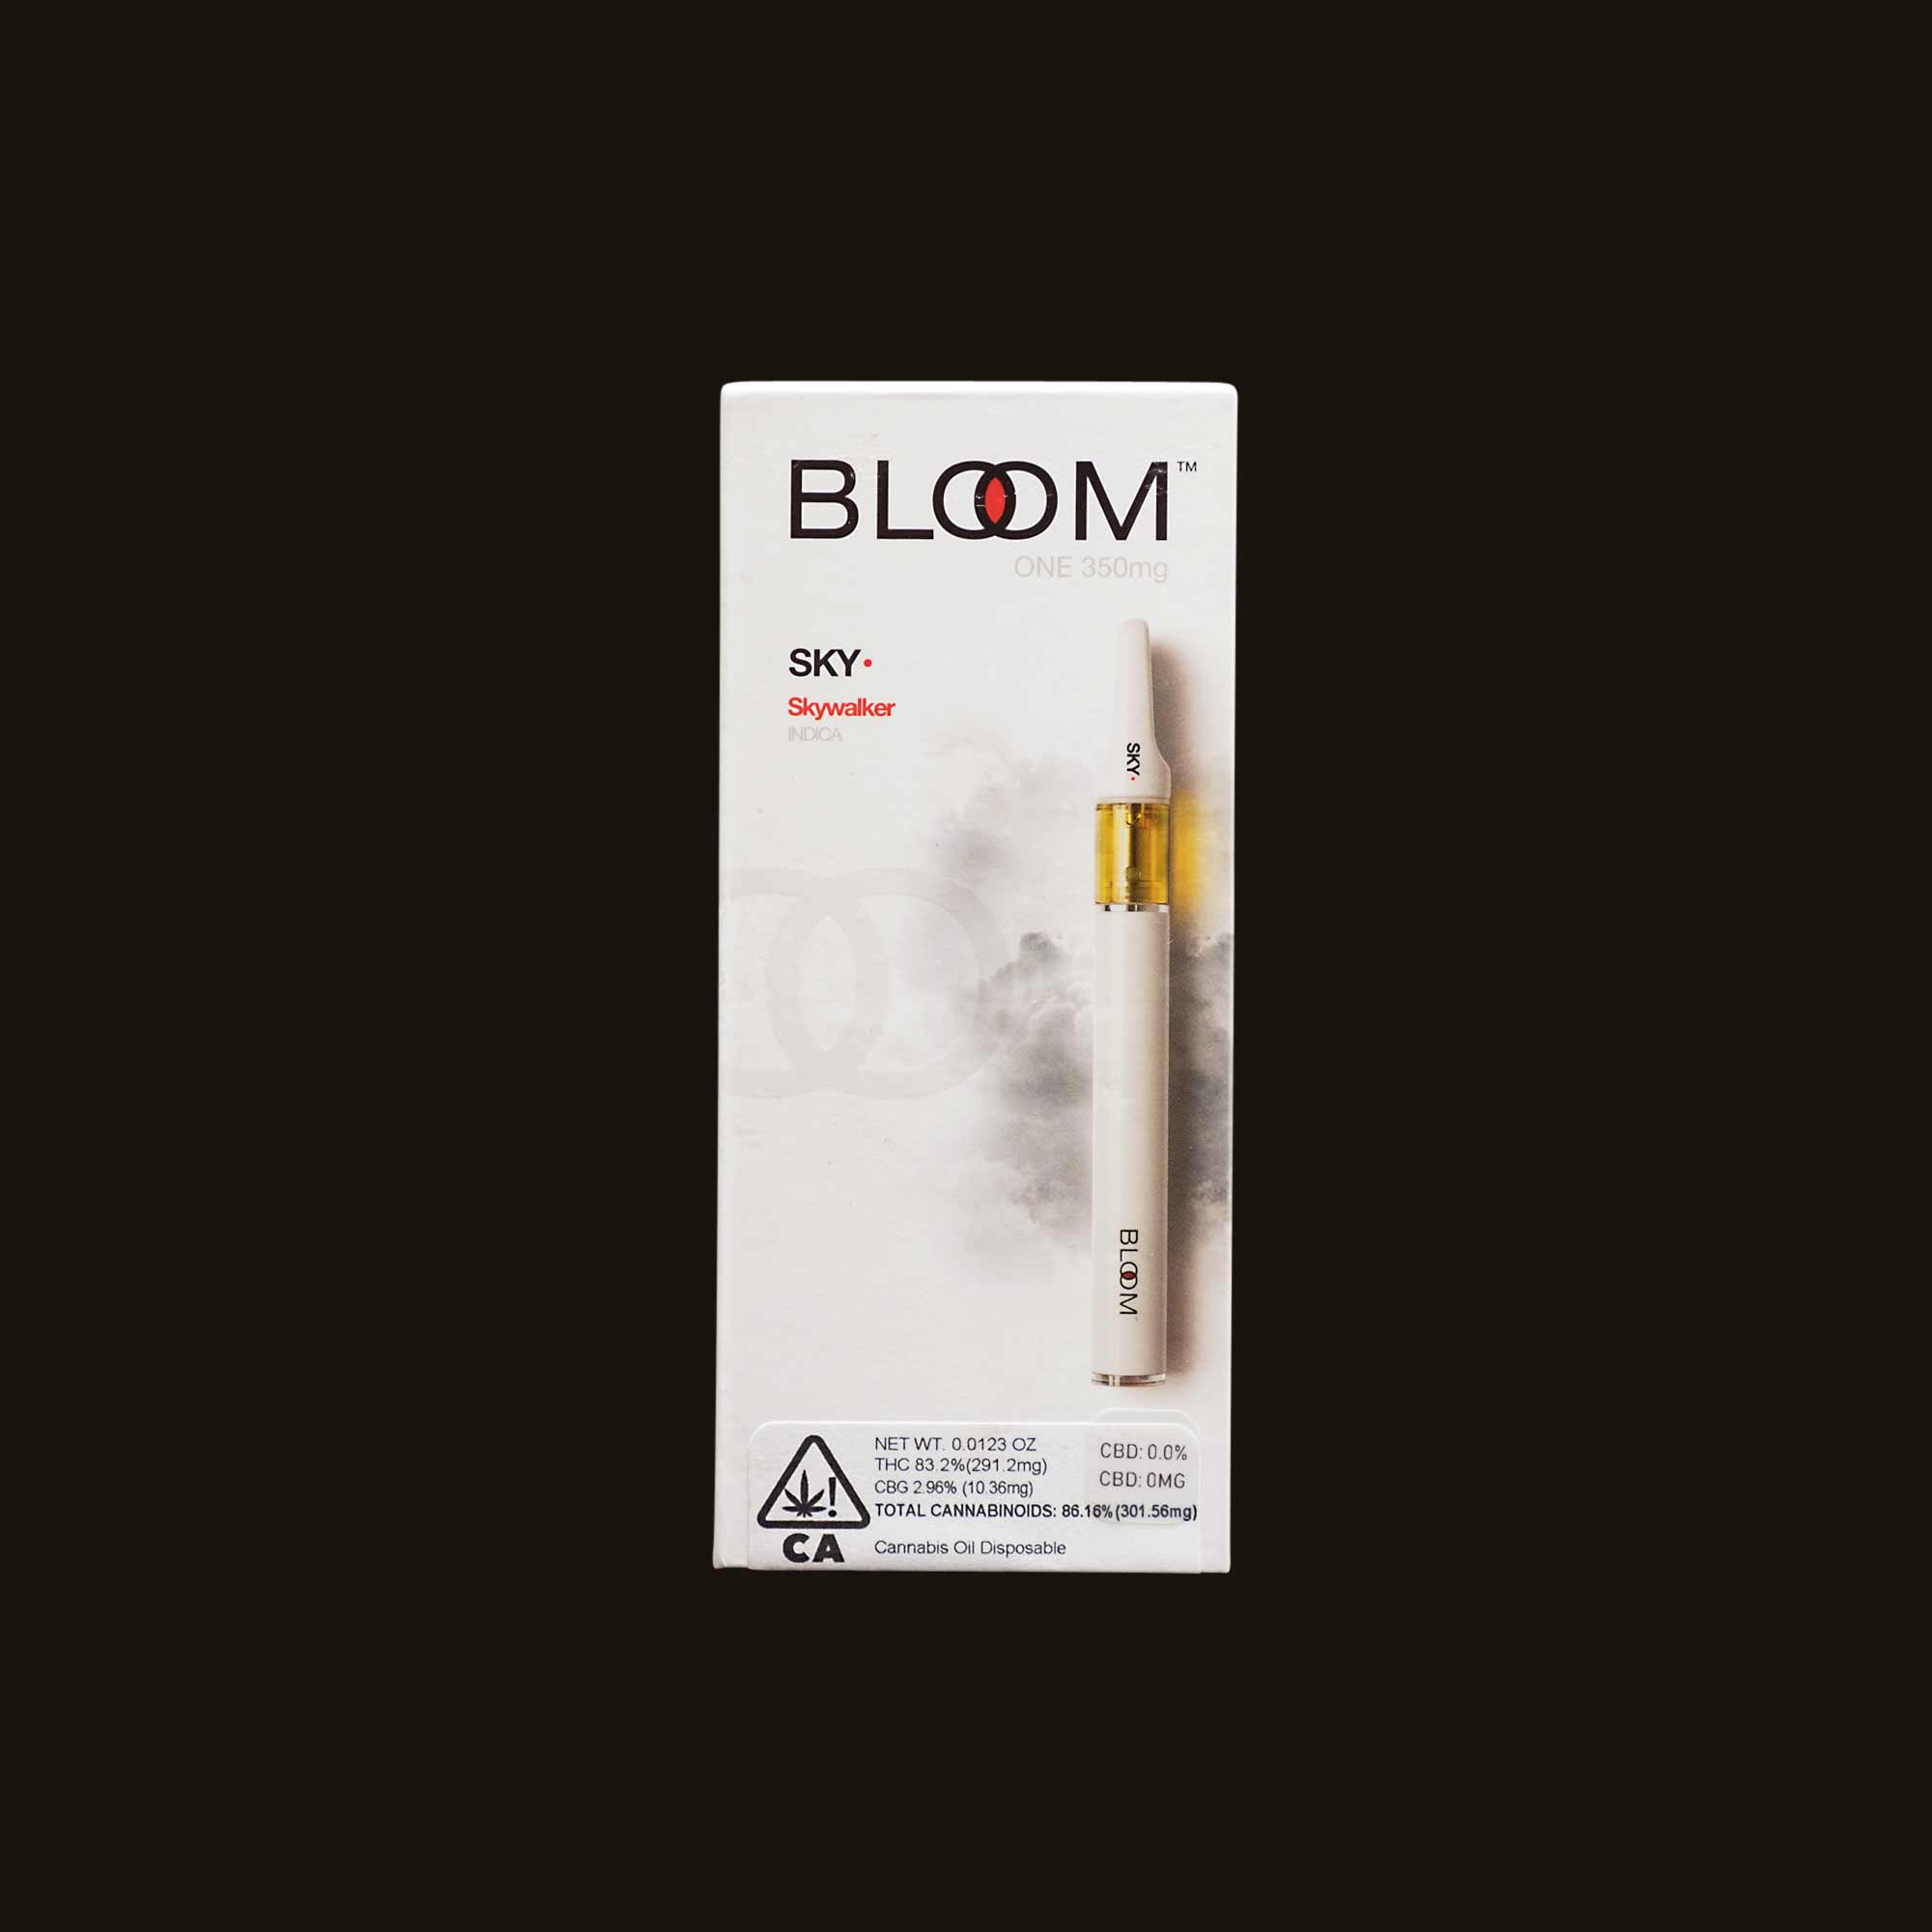 Skywalker Bloom One - 350mg disposable pen